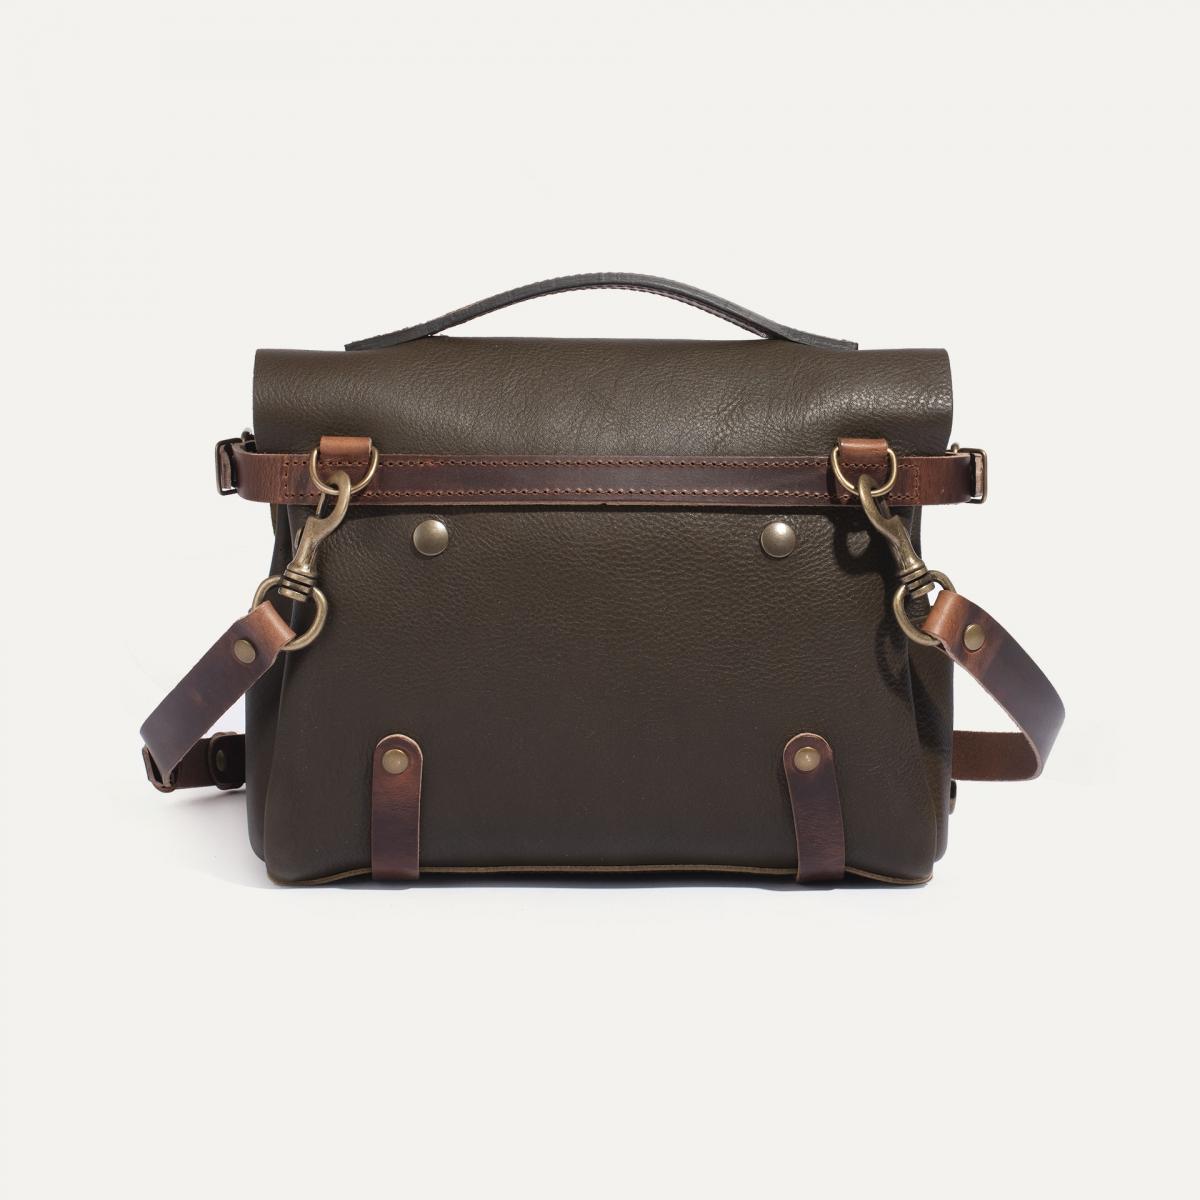 Postman bag Éclair S - Khaki (image n°3)